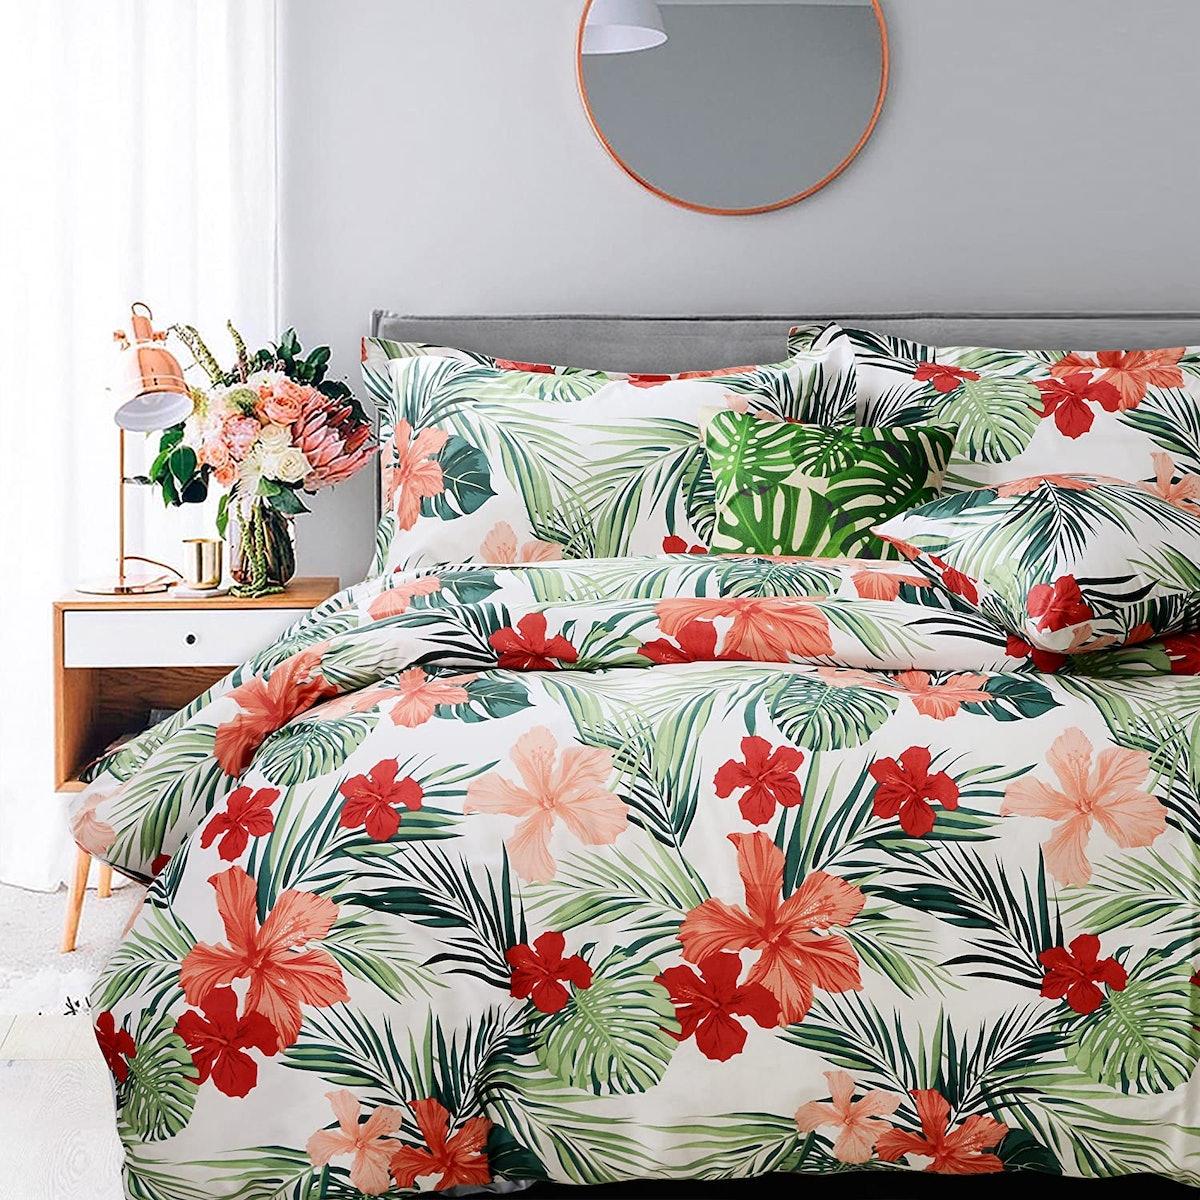 FADFAY Tropical Dorm Bedding (5-Piece)